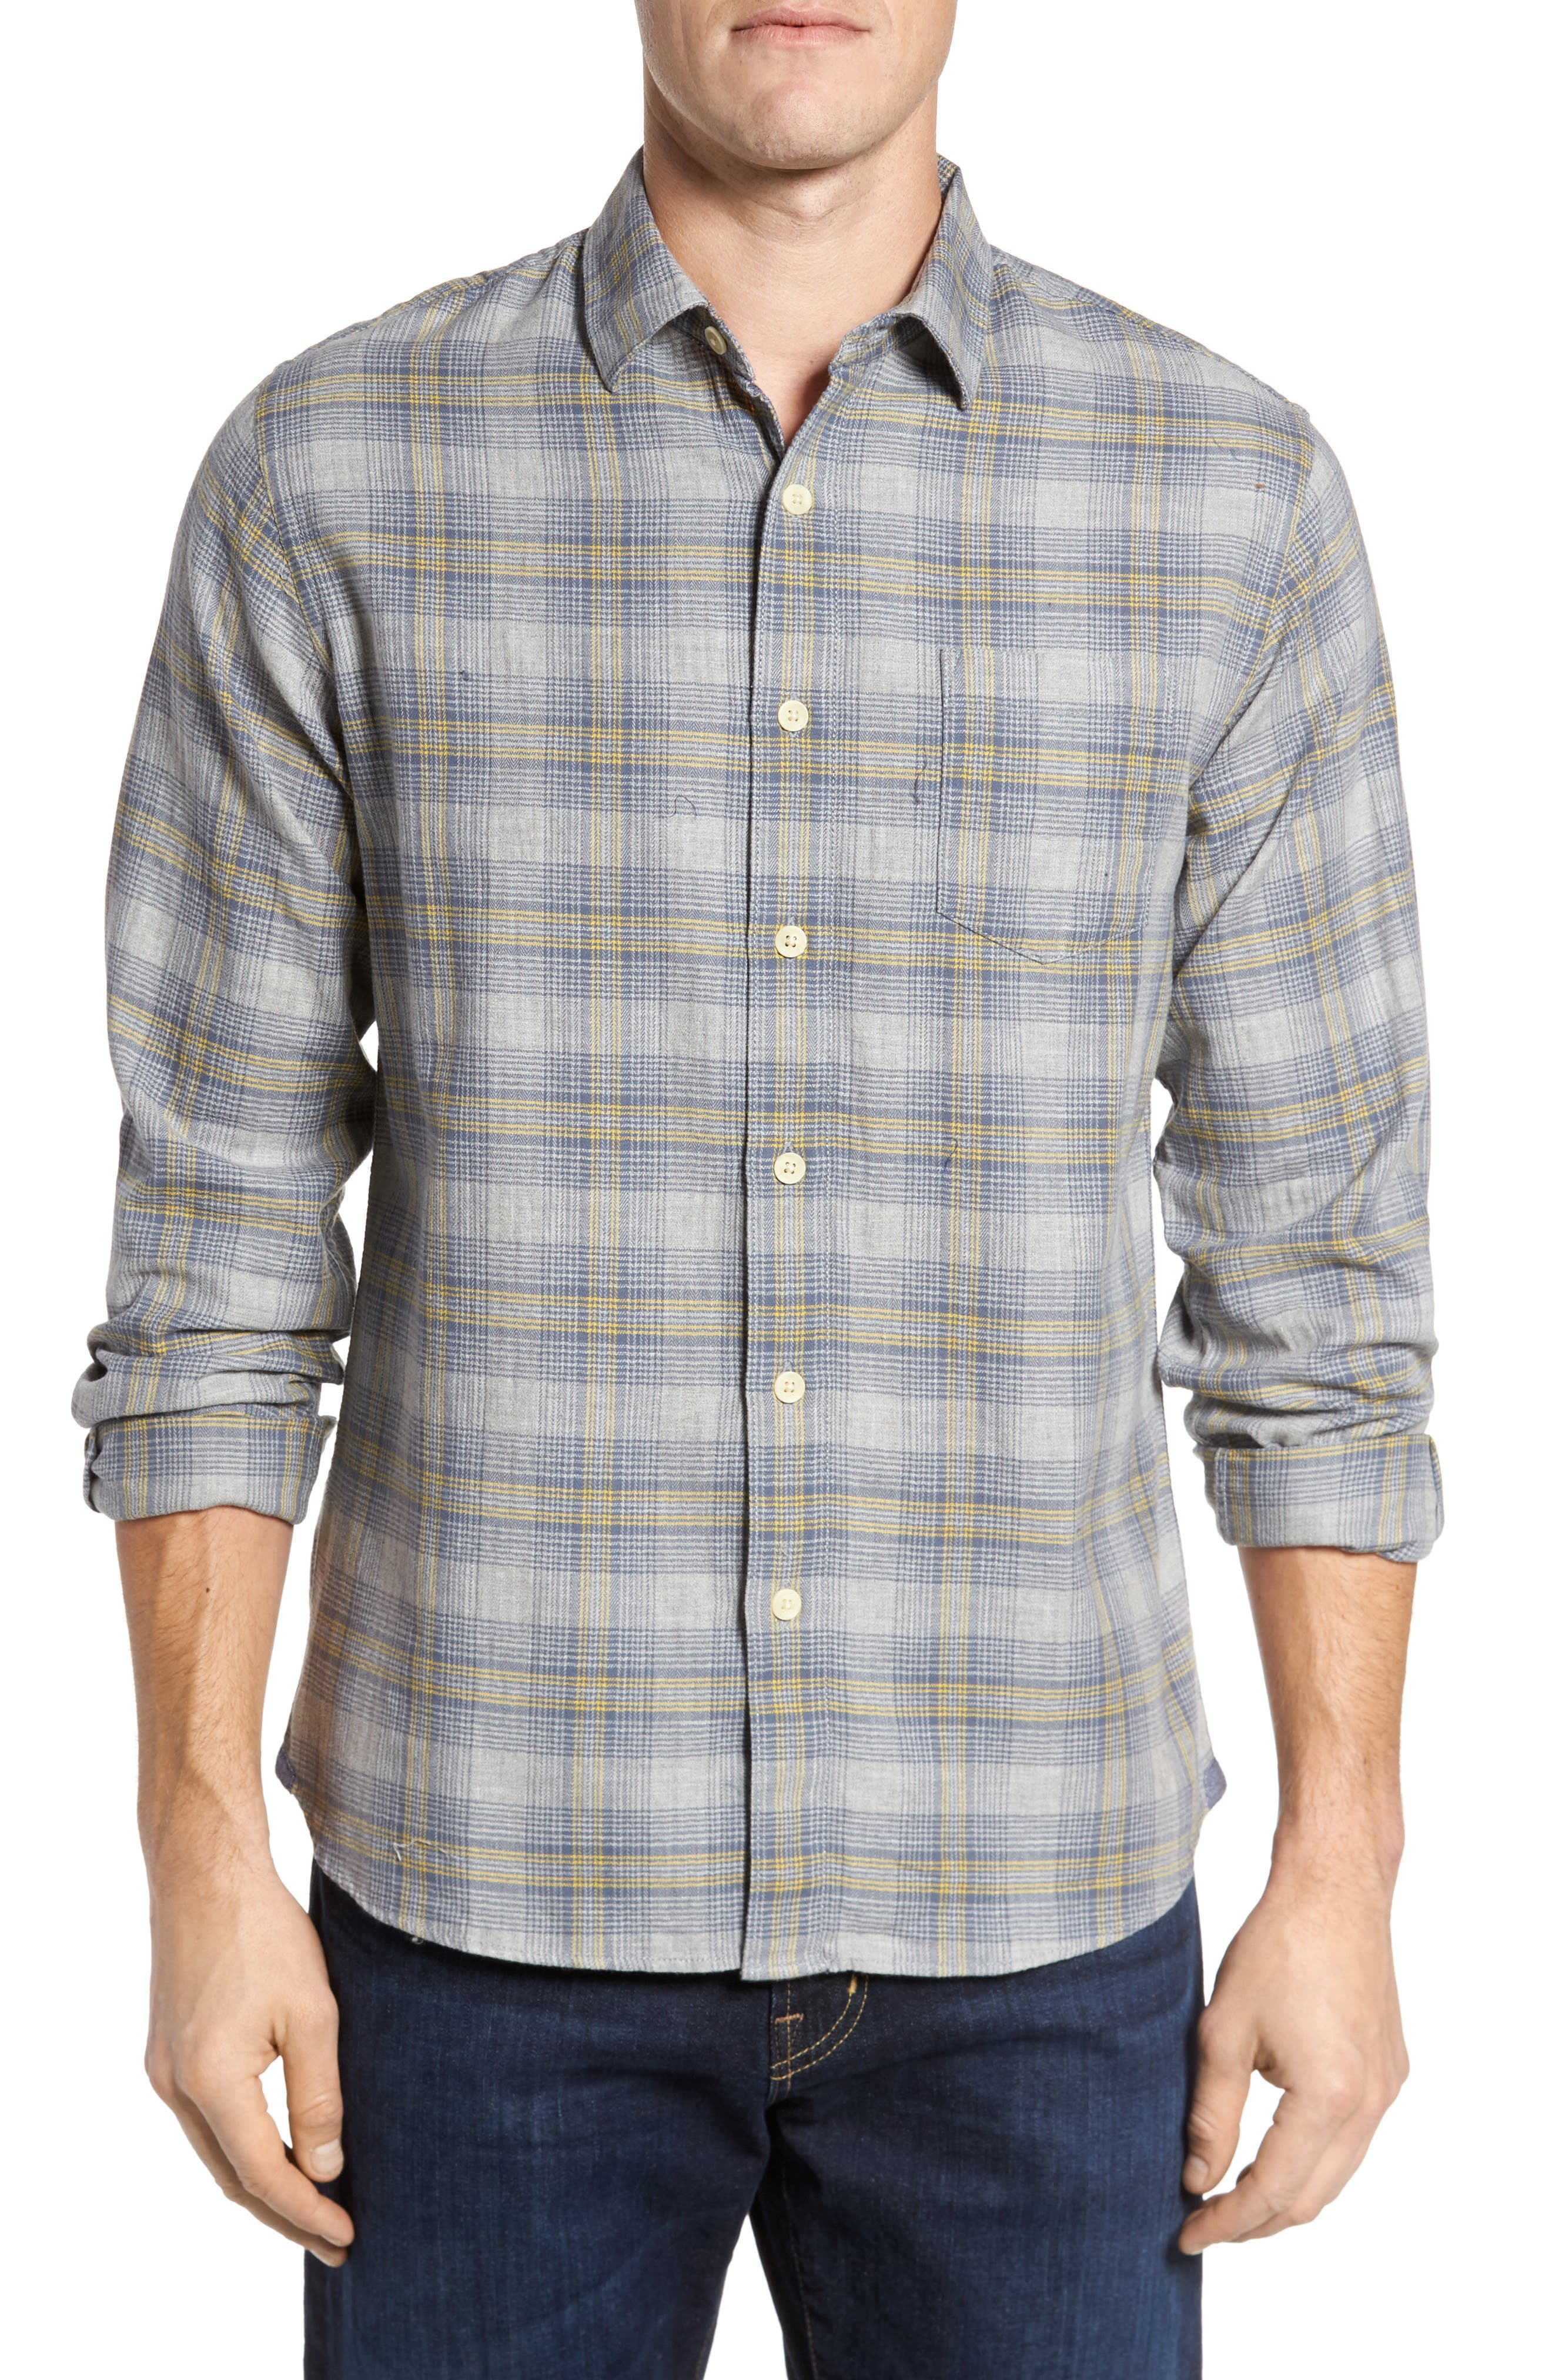 Laugna Herringbone Twill Shirt,                         Main,                         color, 032